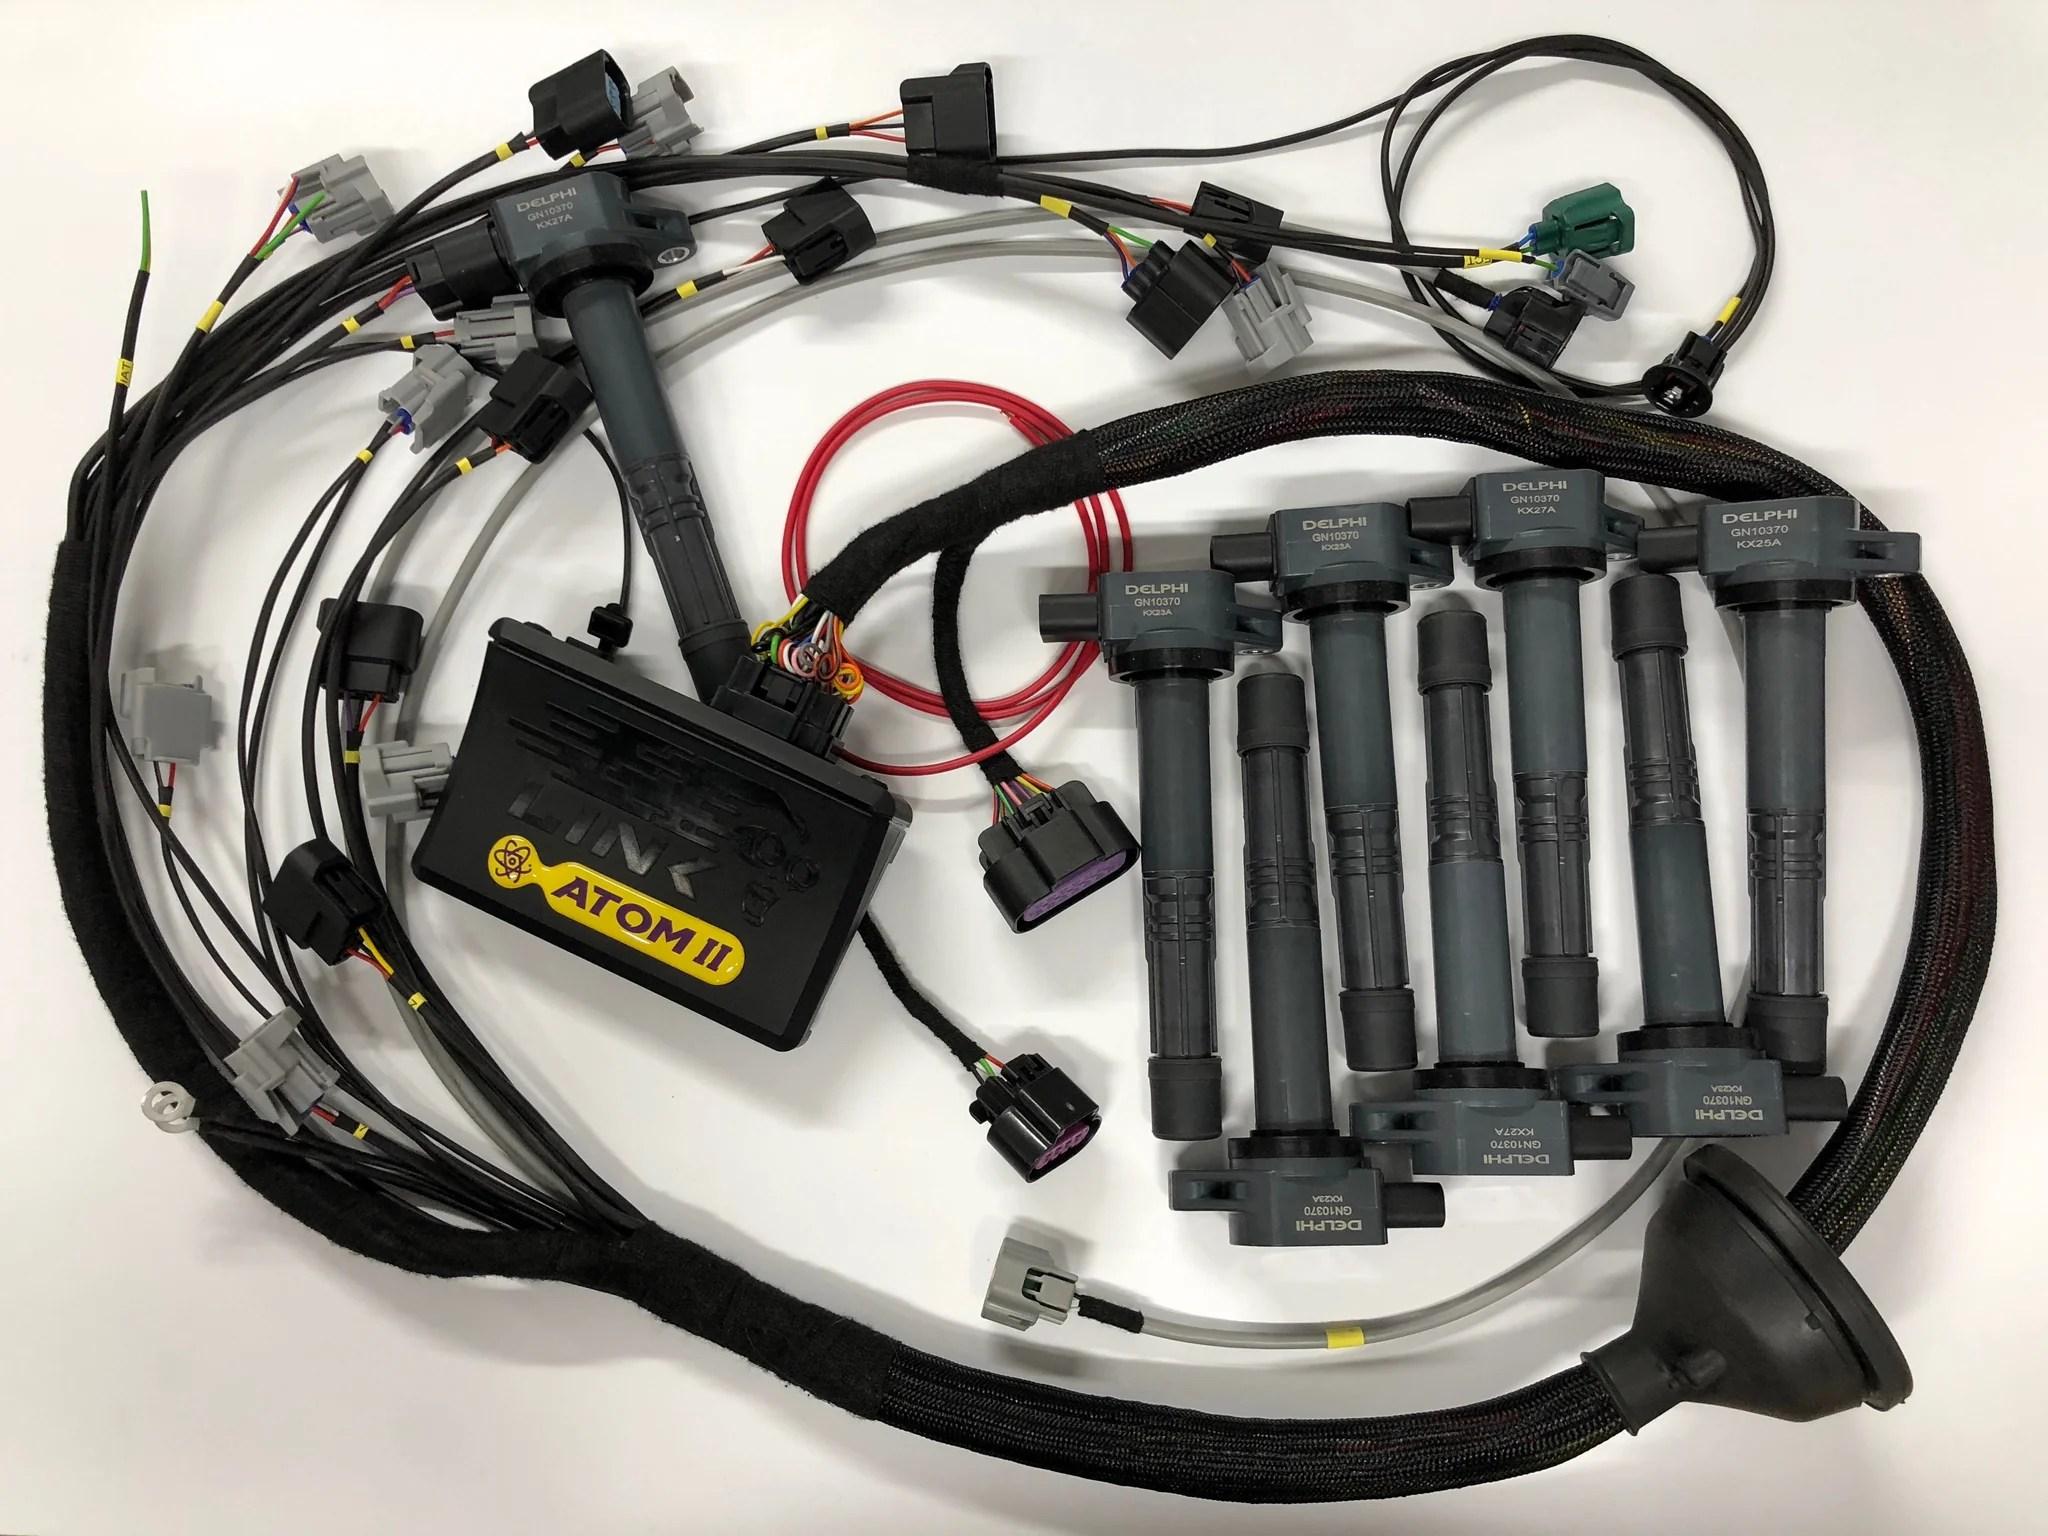 medium resolution of link g4 atom storm xtreme thunder ecu 1uzfe 1uz with wiring 1uzfe wiring harness 1uz wiring harness